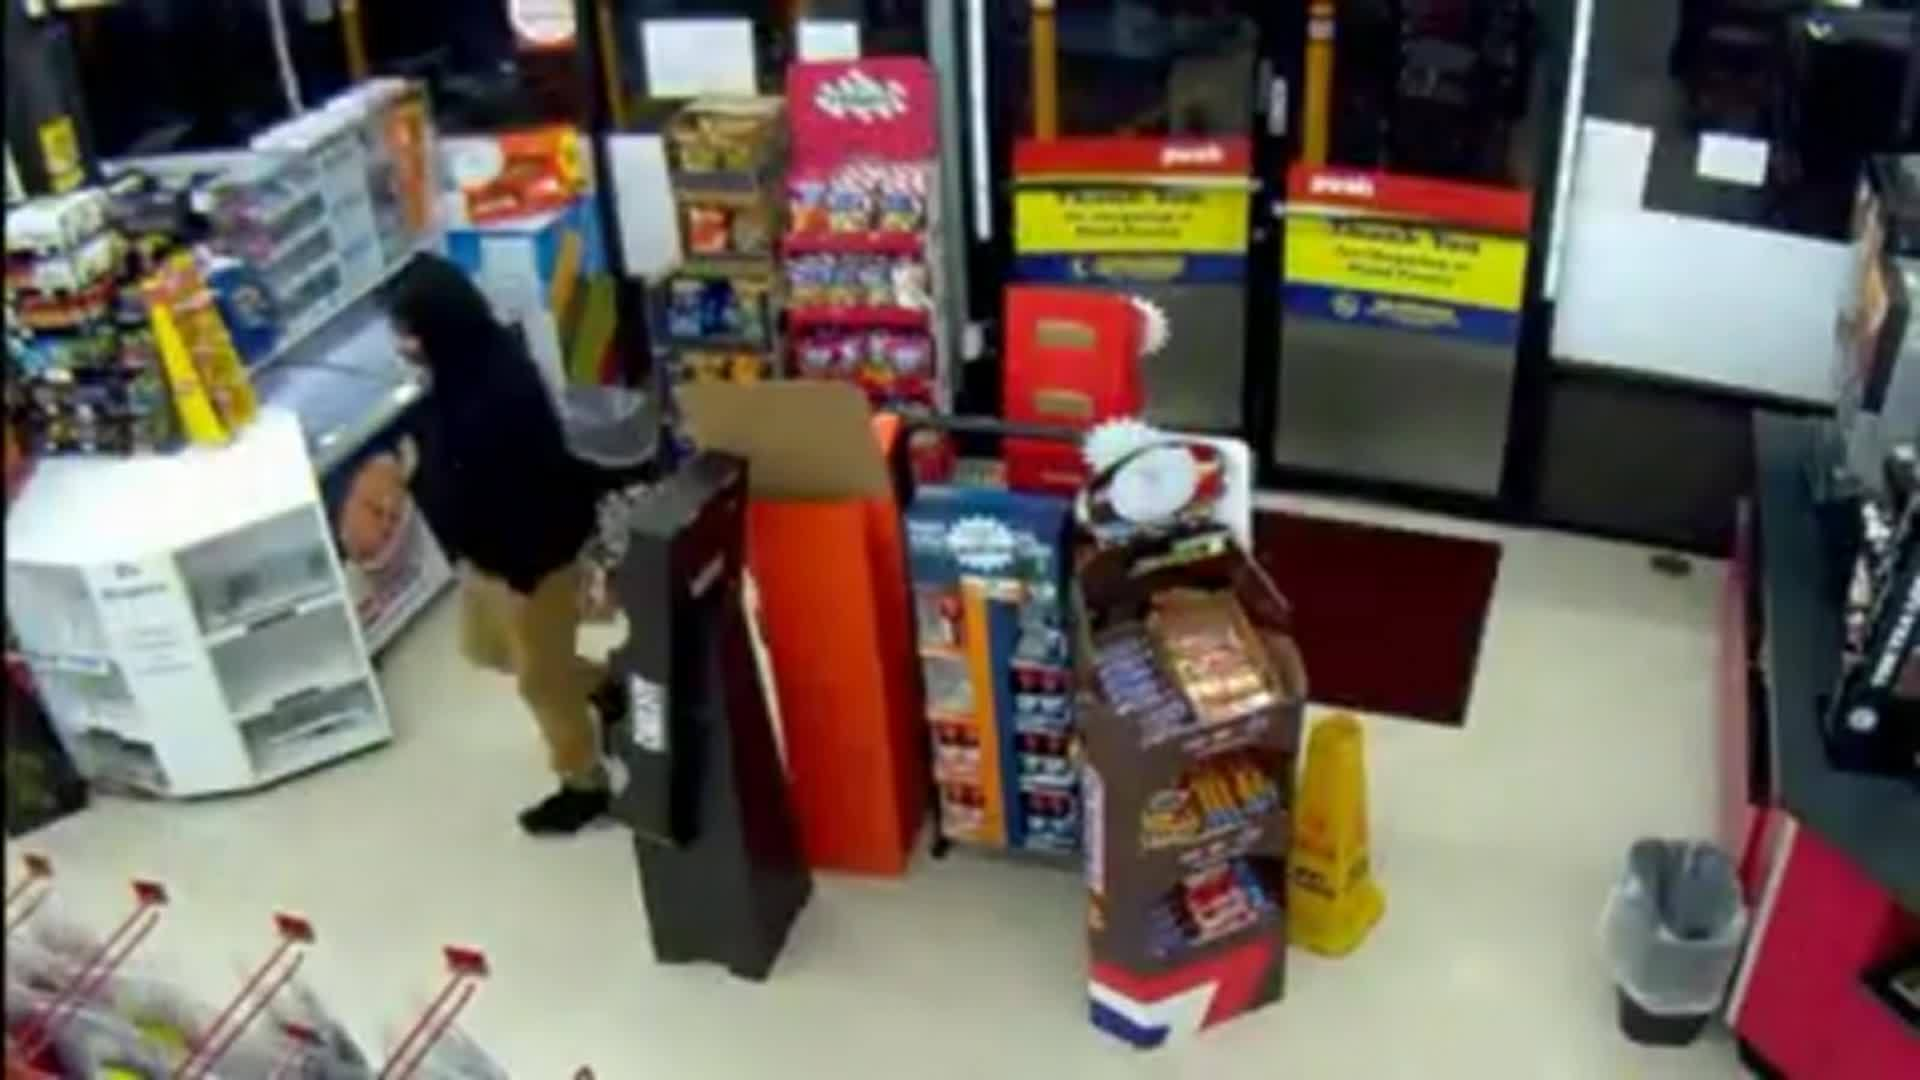 Hatchet-wielding thief runs into gun-toting store clerk